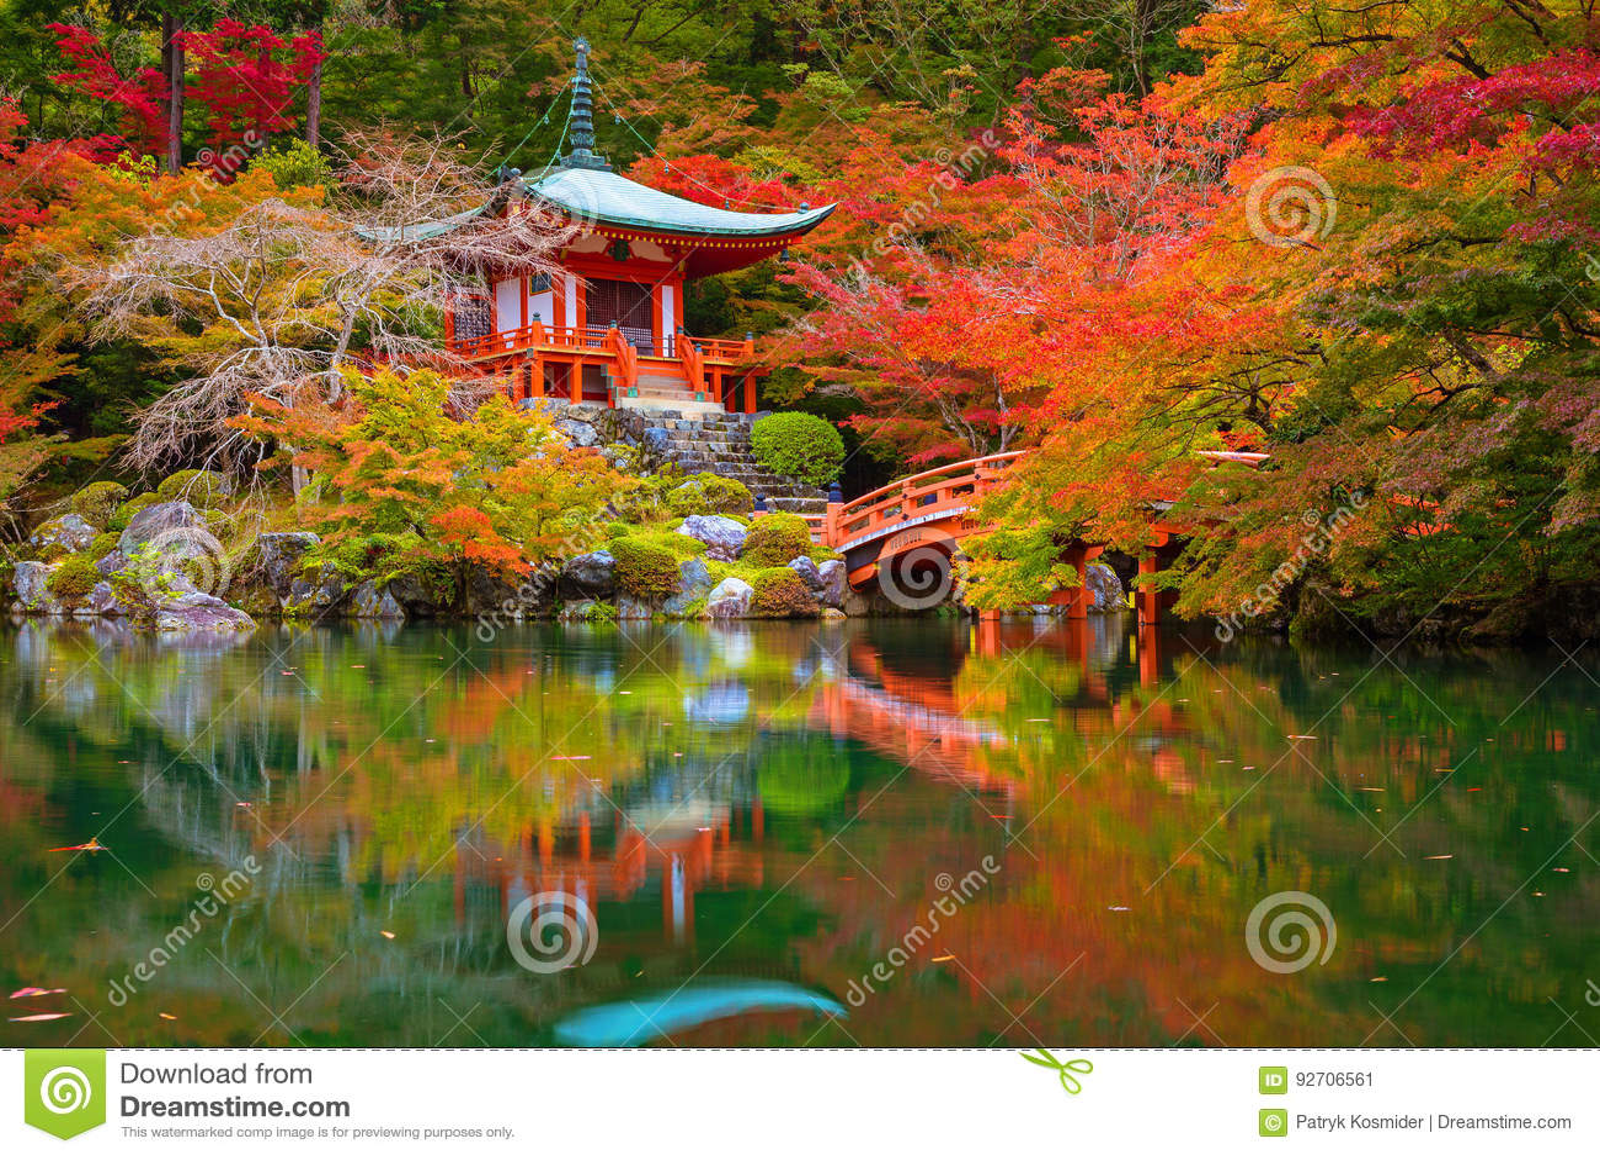 Daigo-jitempel mit bunten Ahornbäumen im Herbst, Kyoto